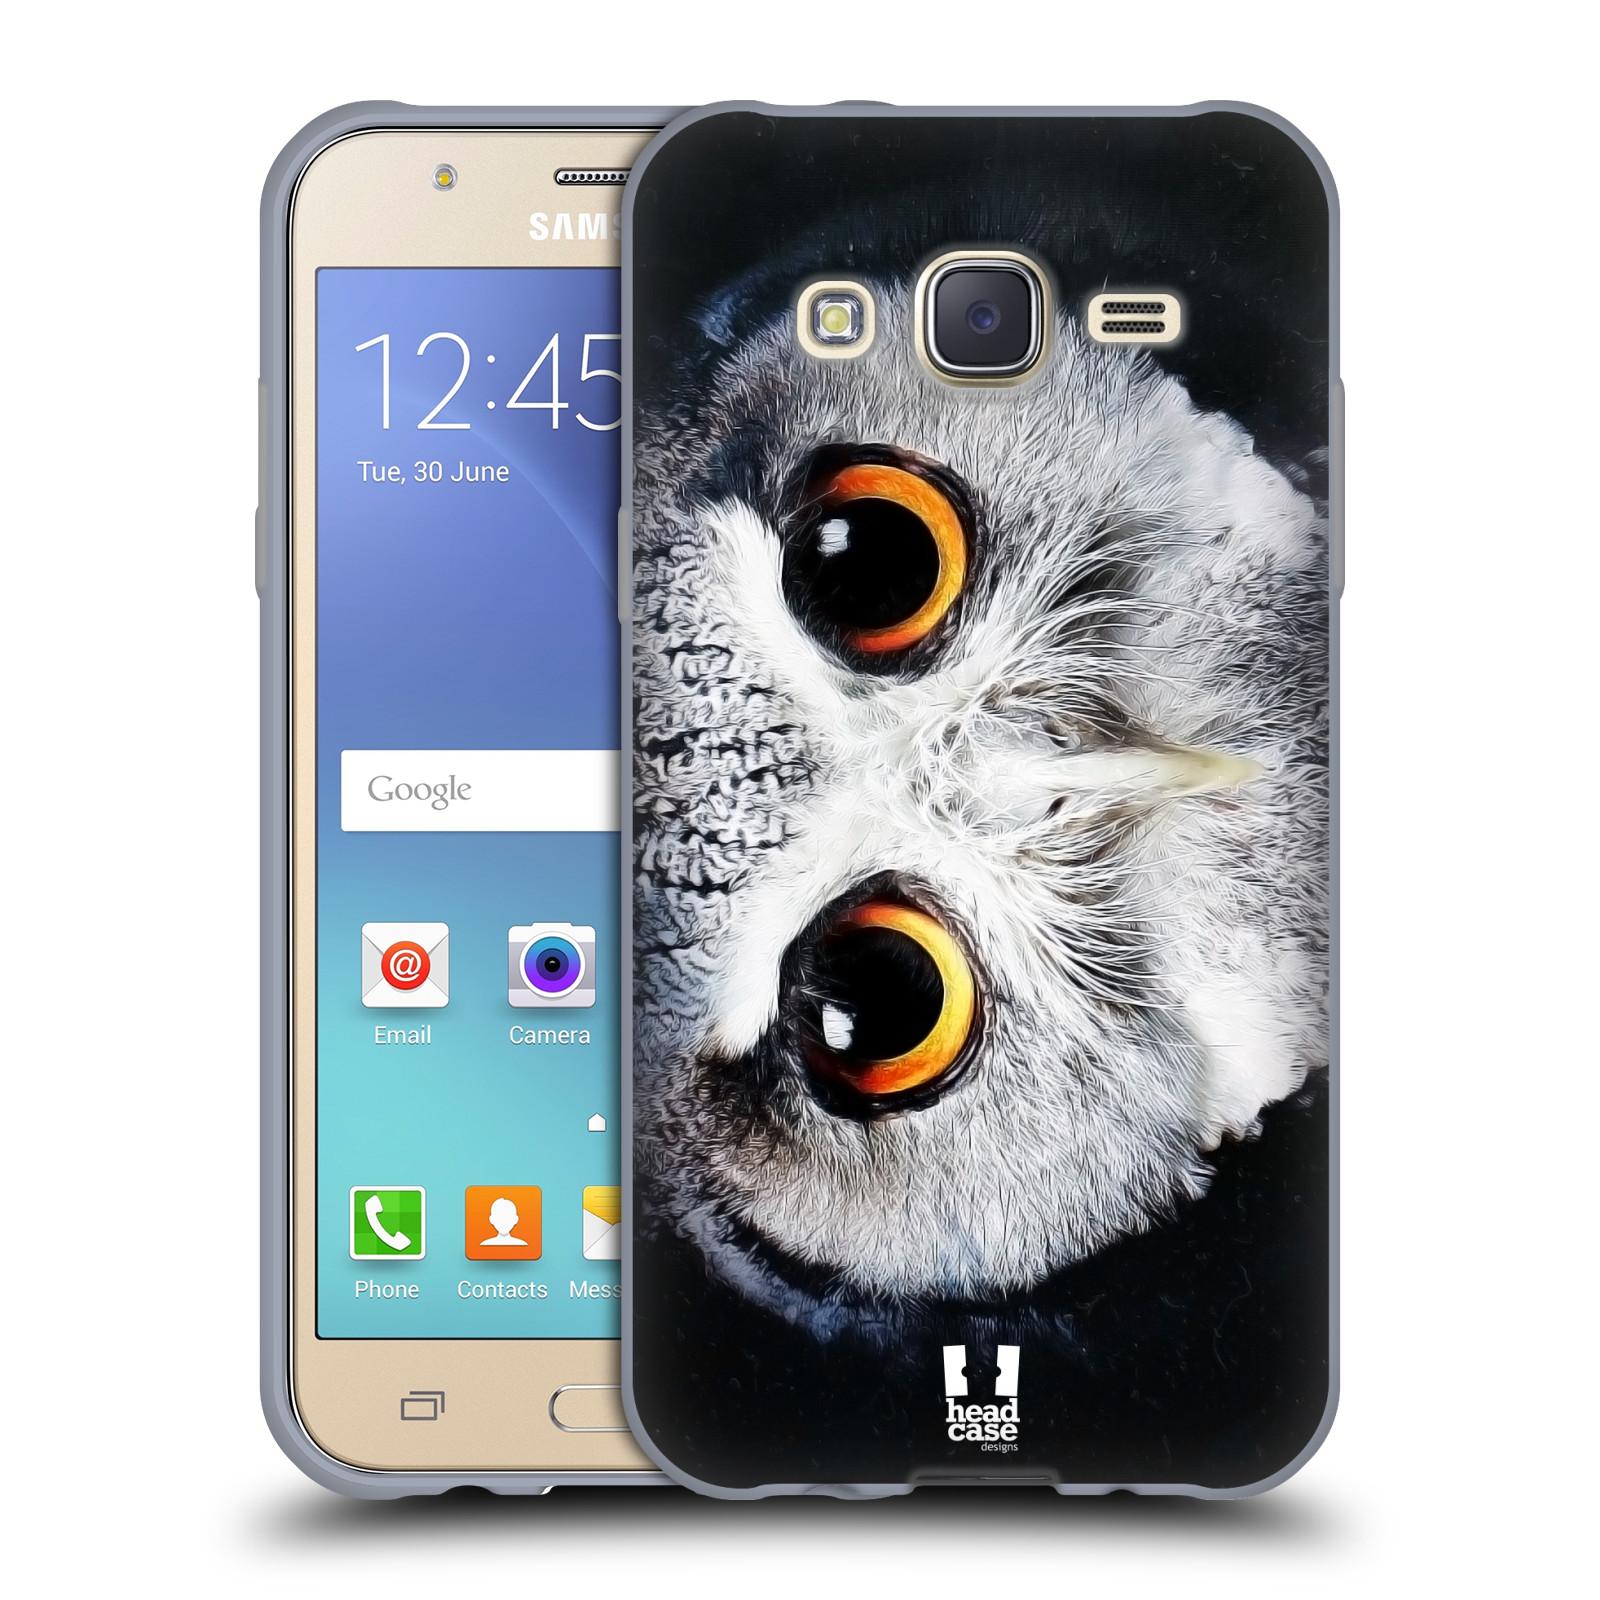 HEAD CASE silikonový obal na mobil Samsung Galaxy J5, J500, (J5 DUOS) vzor Zvířecí tváře sova